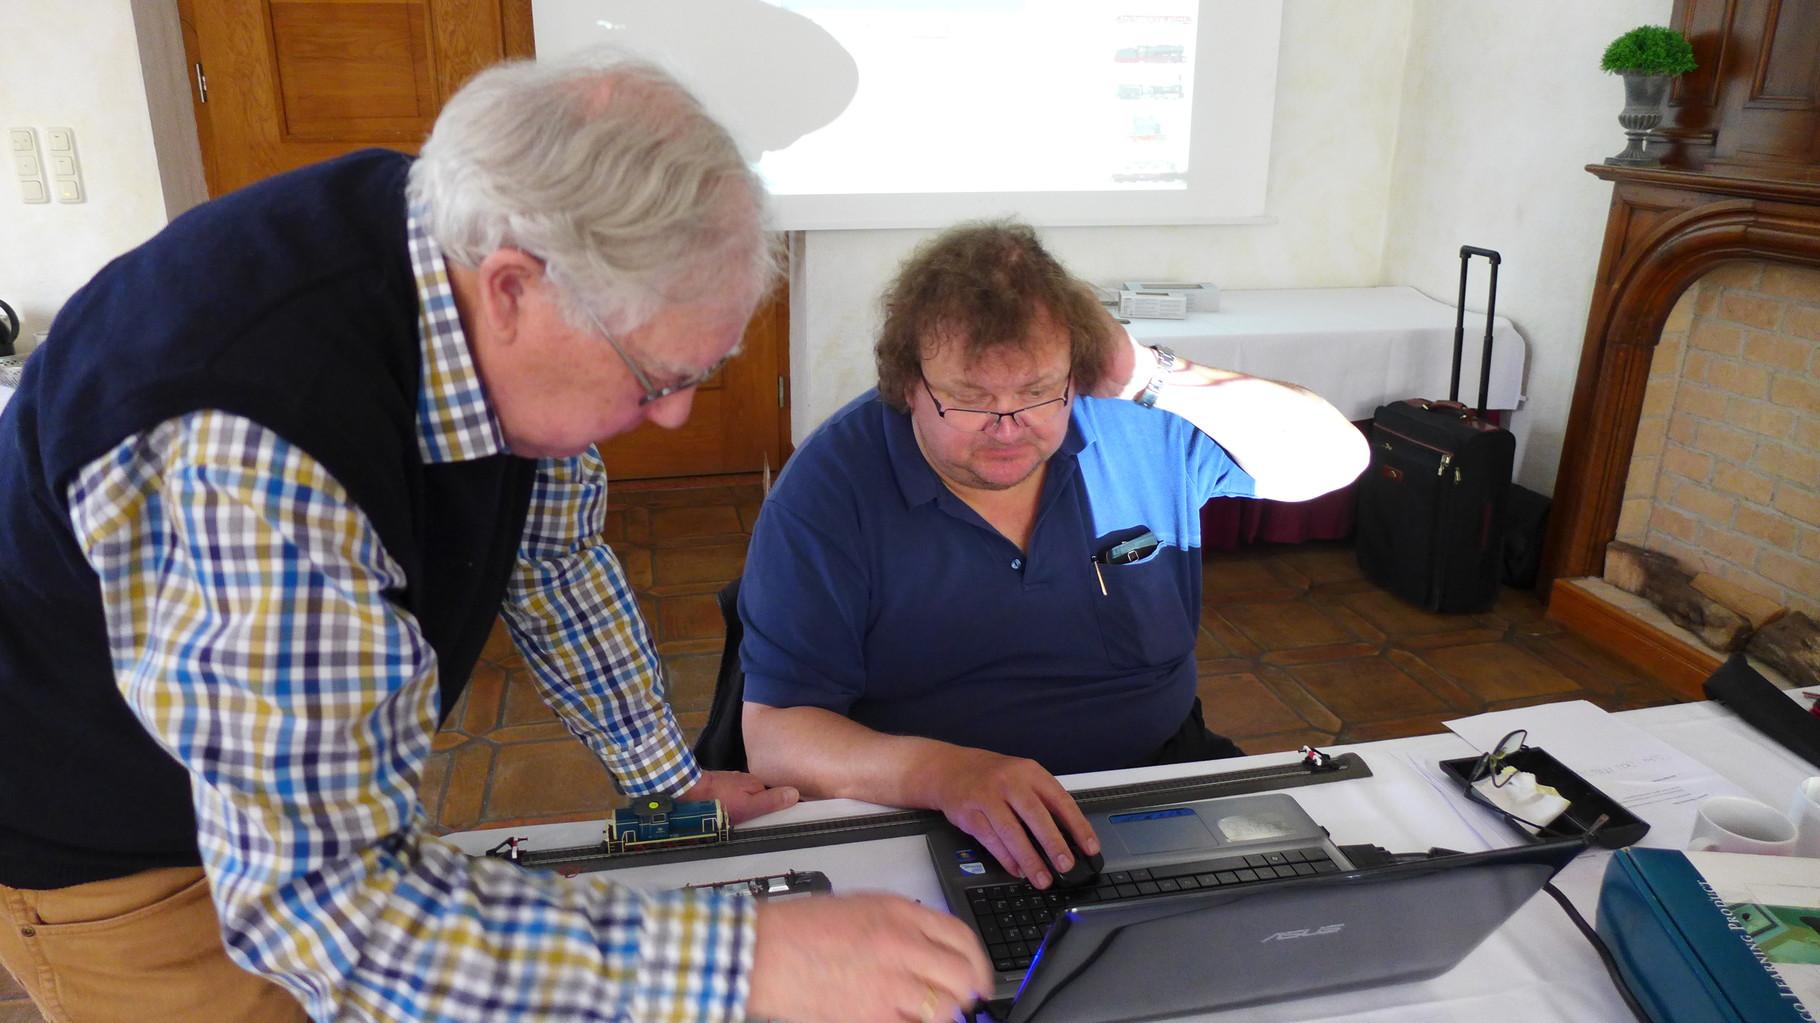 Die beiden Betatester: Wolfgang Elsholz (Augsburg) und Bernd Senger (Berlin)